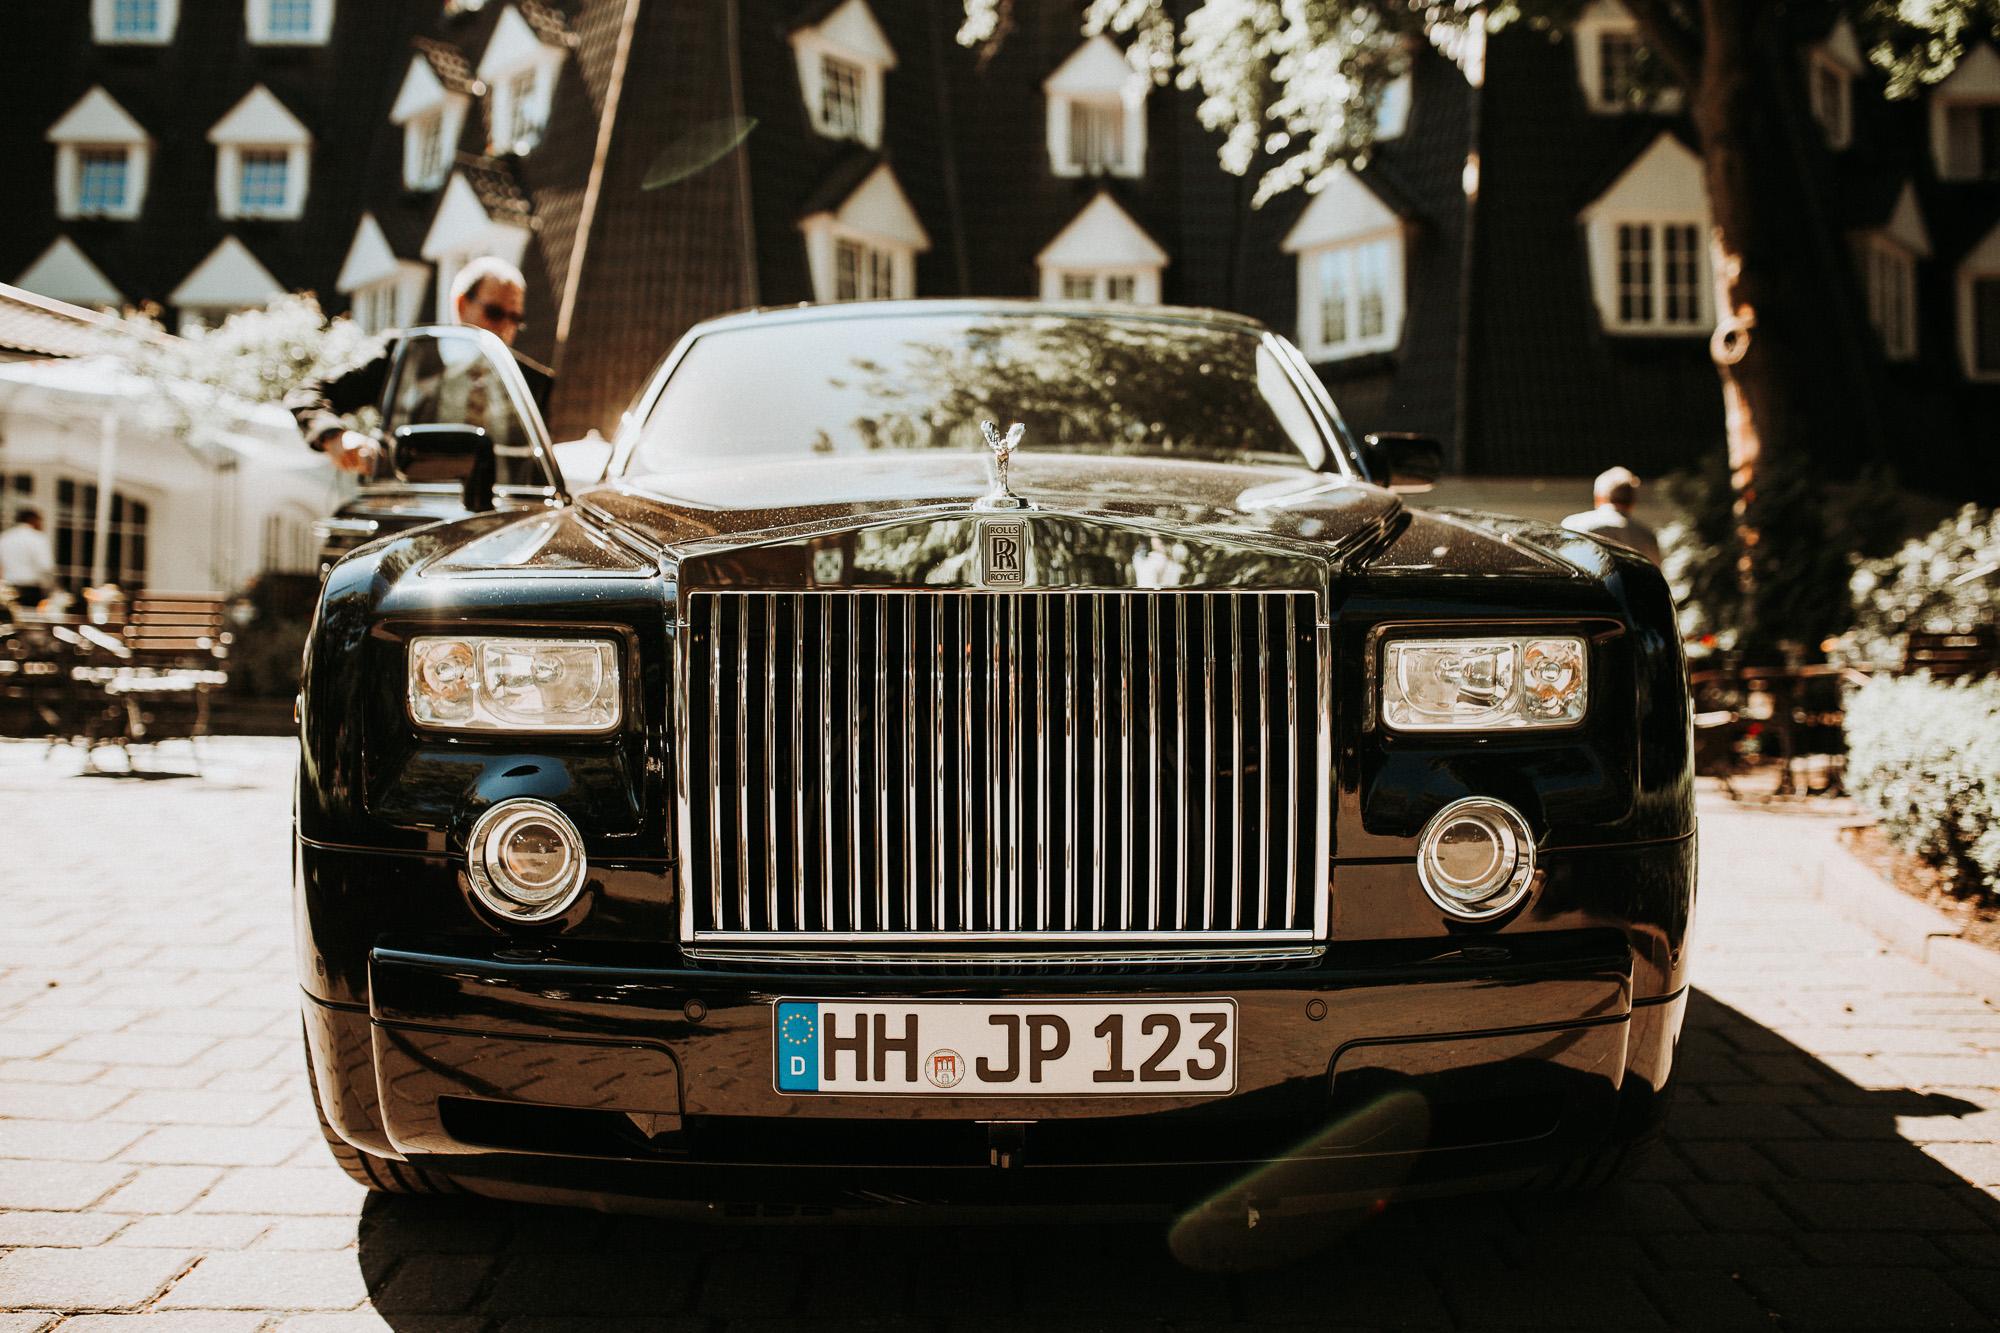 DanielaMarquardtPhotography_Hochzeitsfotograf_Düsseldorf_Köln_Mallorca_Bayern_Austria_Harz_Wedding_AileenundLennart_Weddingphotographer_Ibiza_Tuskany_Italien_Toskana_Portugal_Lissabon55